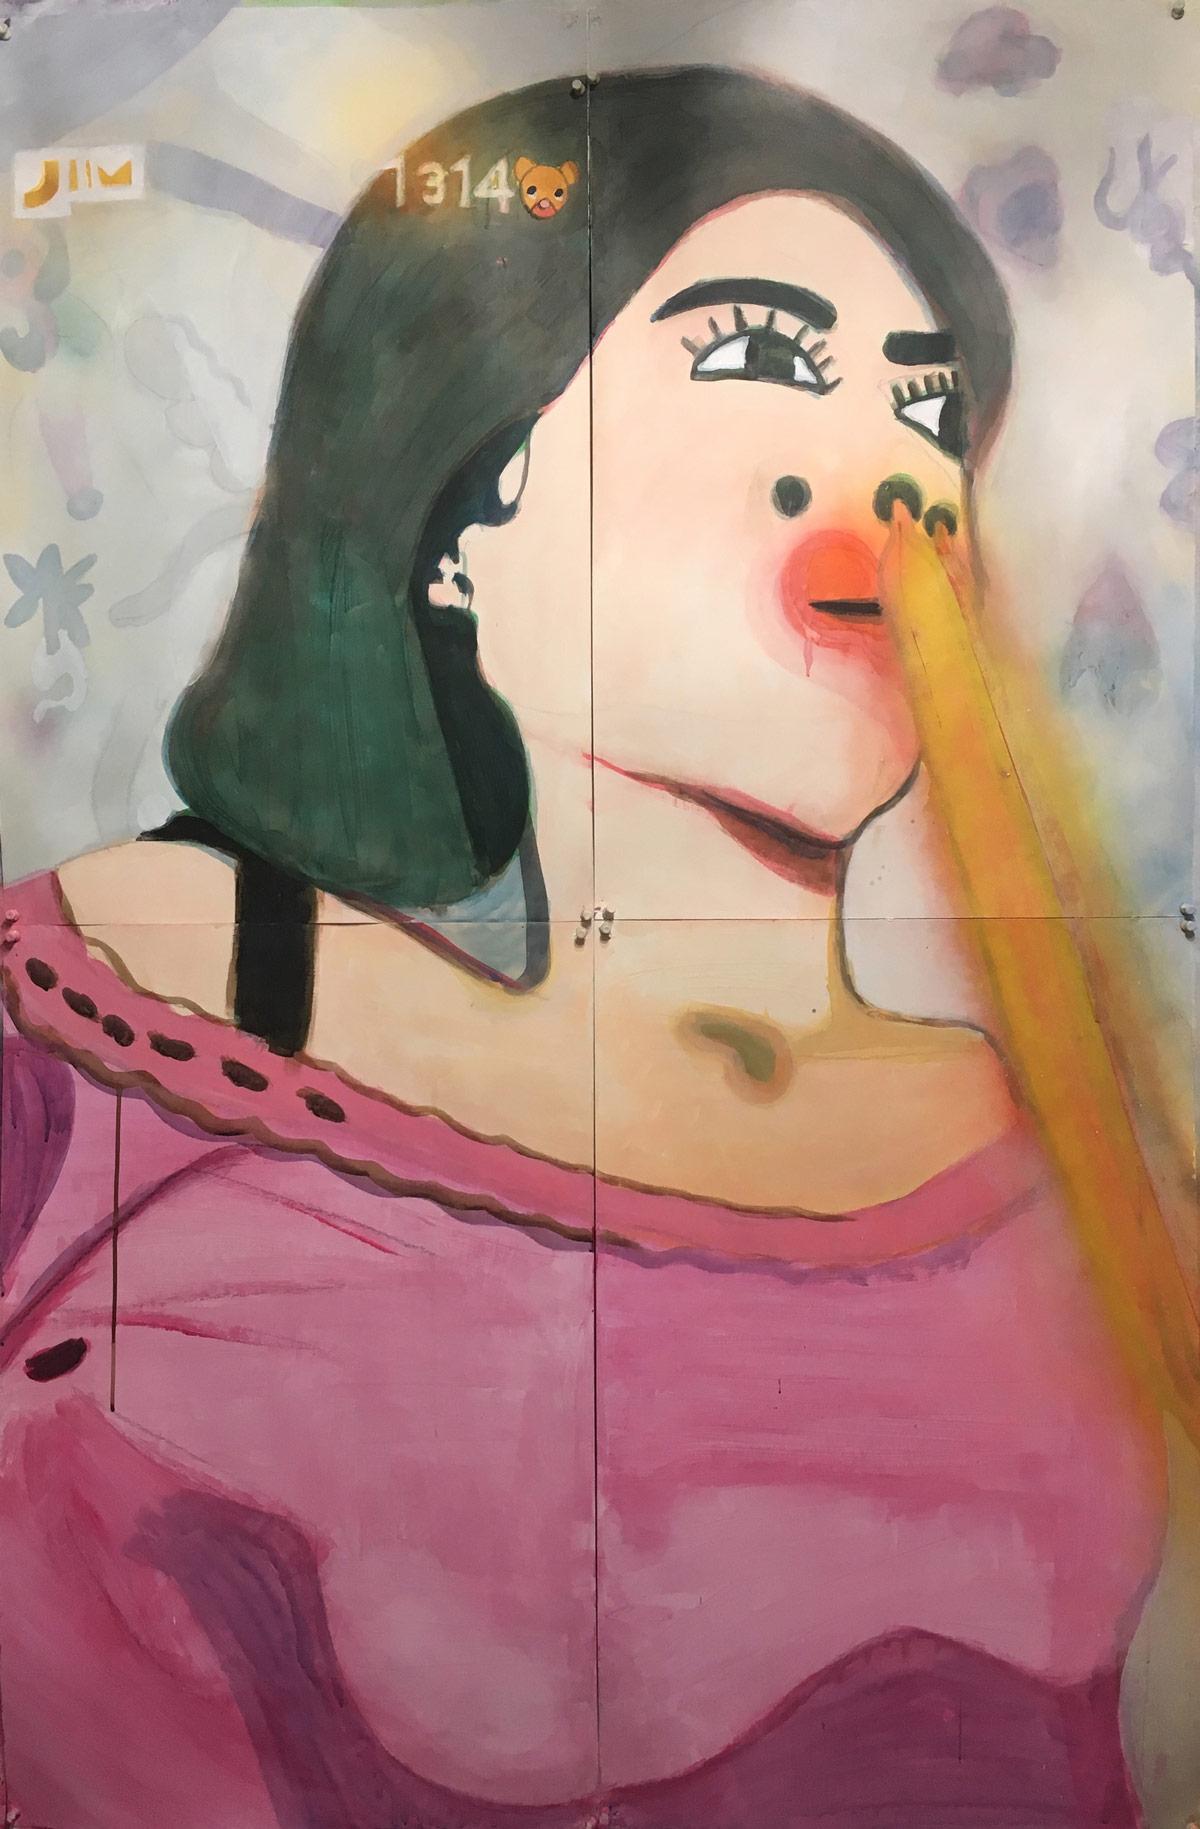 Japanes-Pranks-2017-acrylic-on-paper-47-x-76